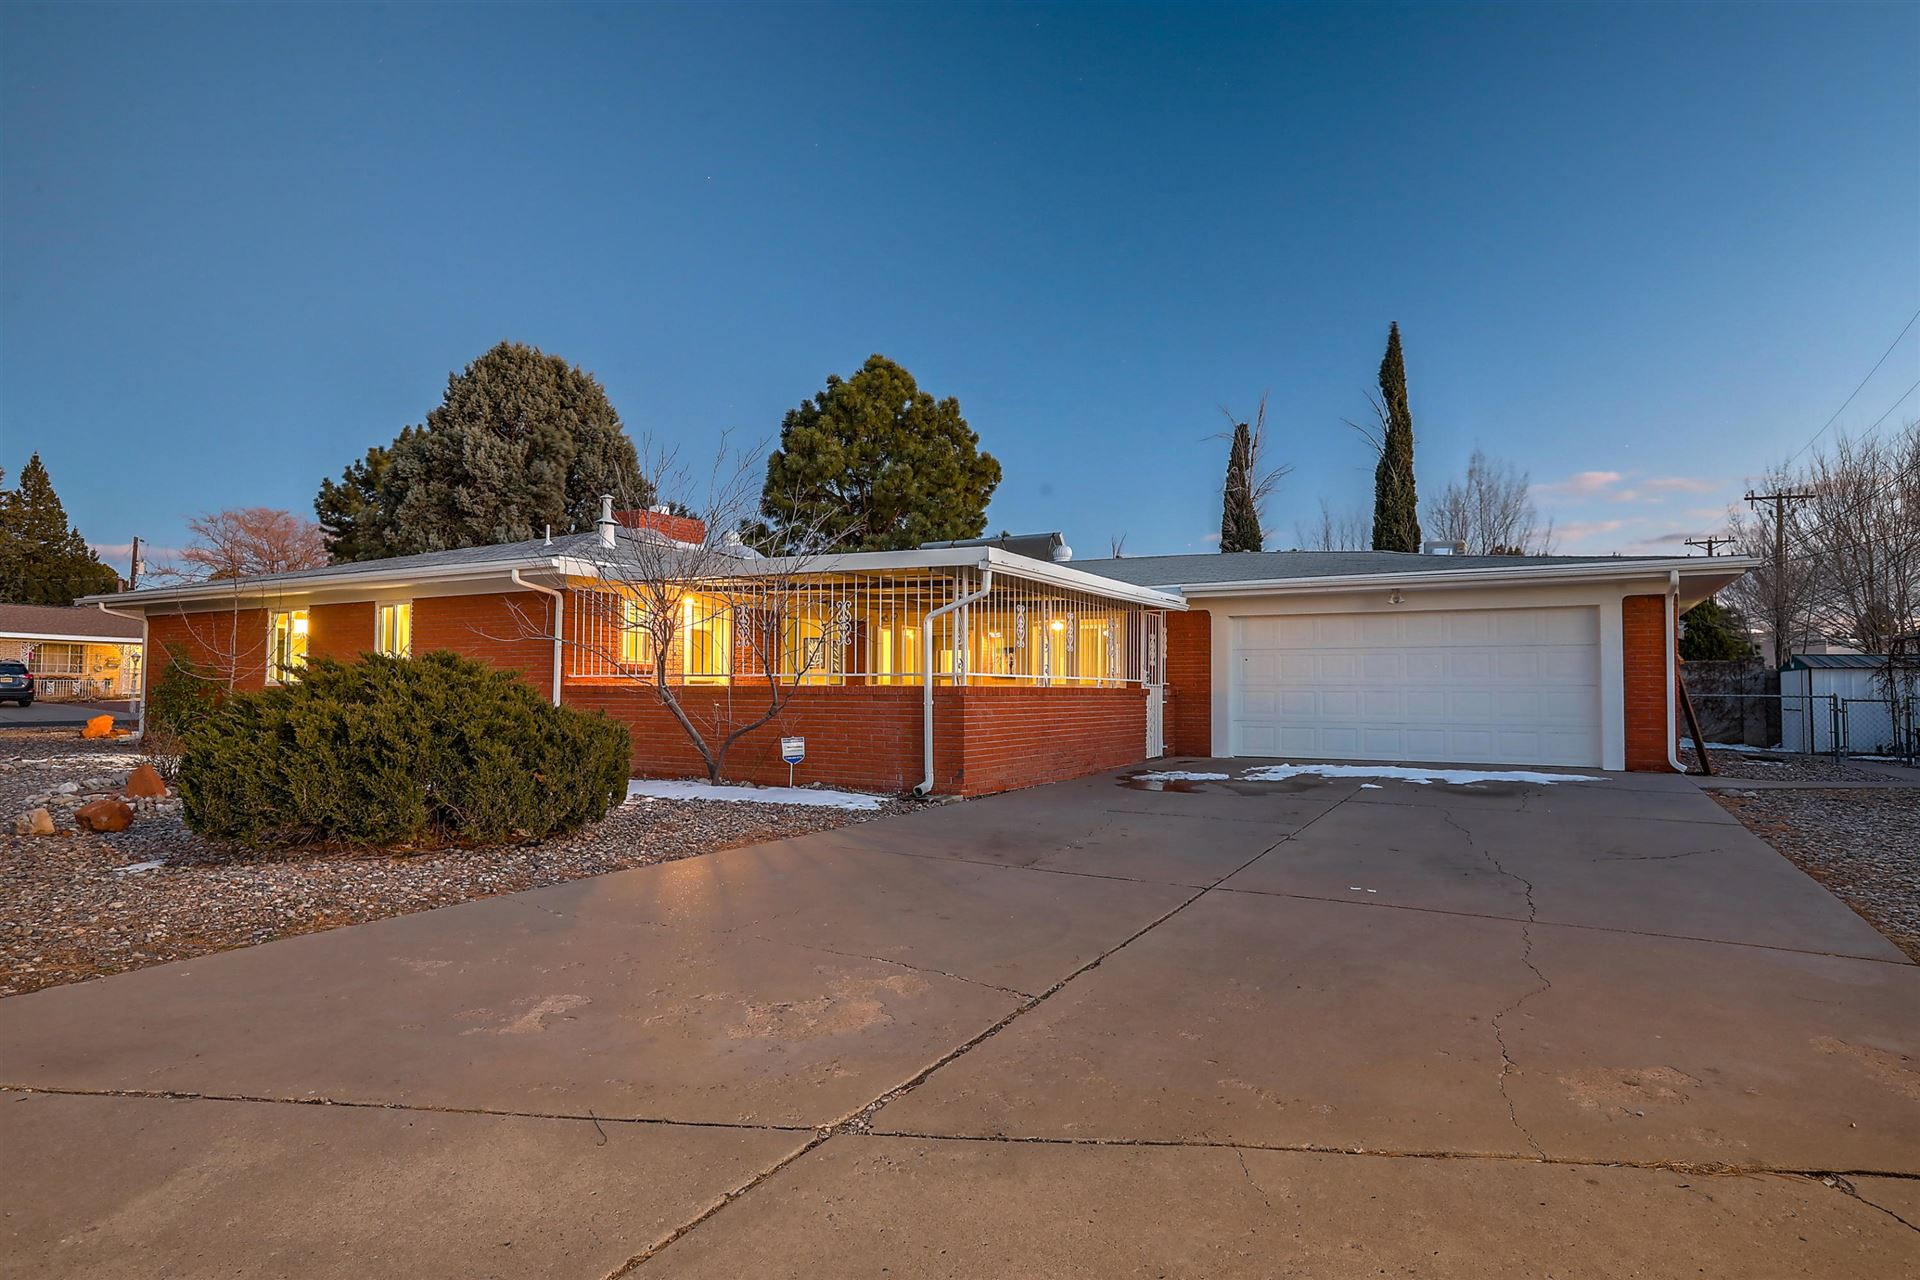 1423 SOLANO Drive NE, Albuquerque, NM 87110 - MLS#: 986151